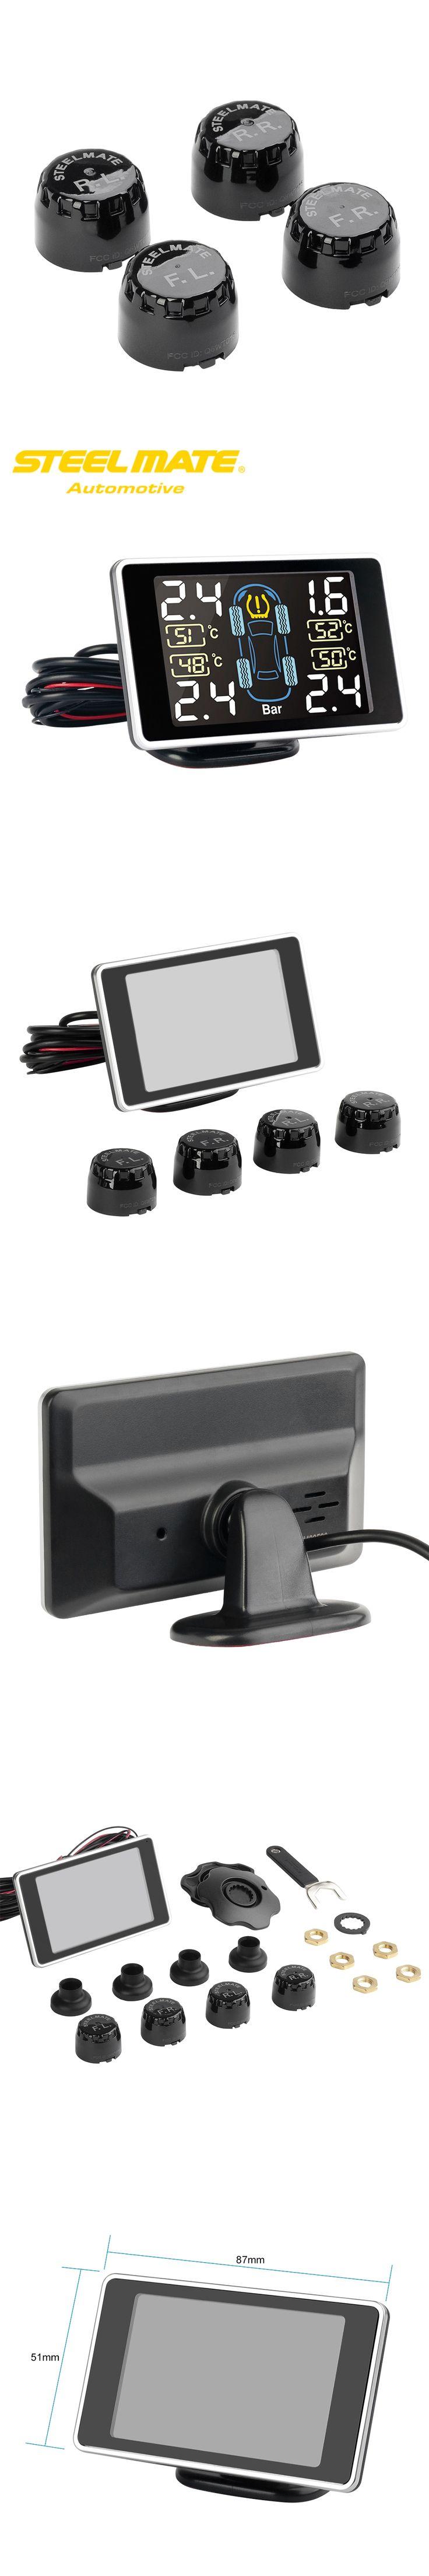 Steelmate TP-11 TPMS Tire Pressure Monitoring System LCD Display 4 Valve-cap External Sensors Bar PSI Unit Wireless Transmission